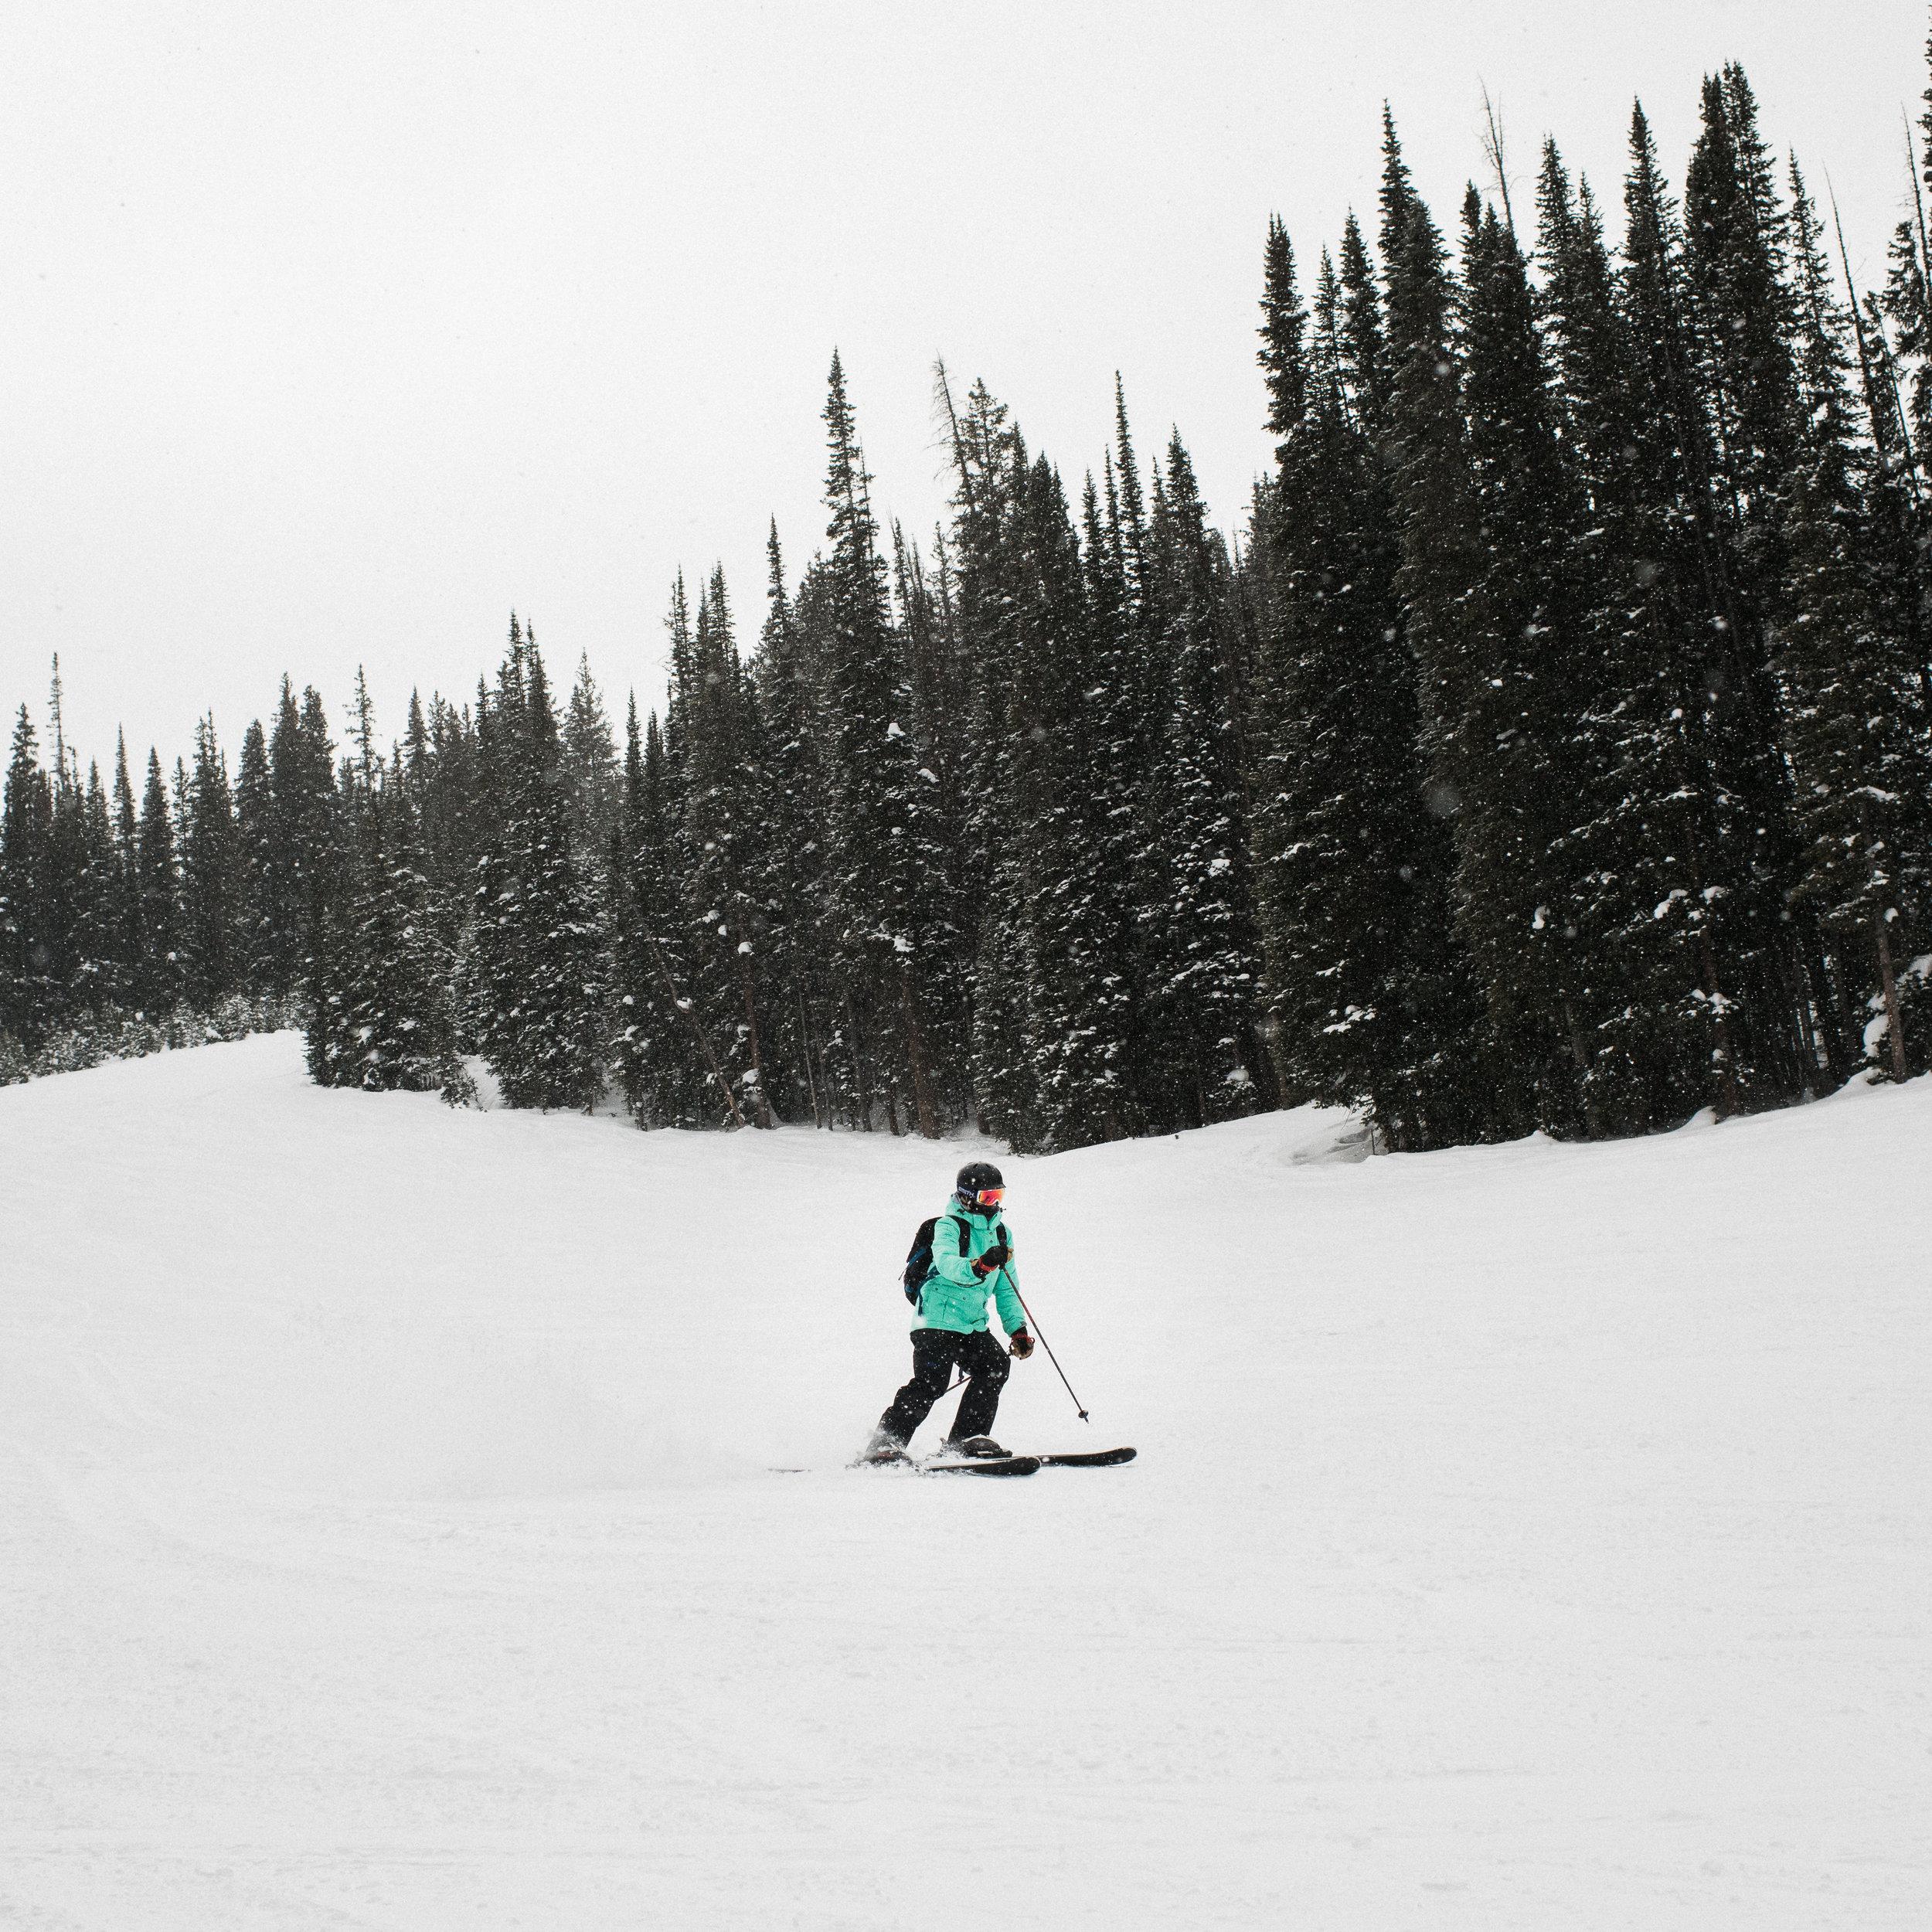 TaraShupe_Outdoor_Photographer_Loweprobags_Colorado_Copper_Mountains_Ski_11.jpg